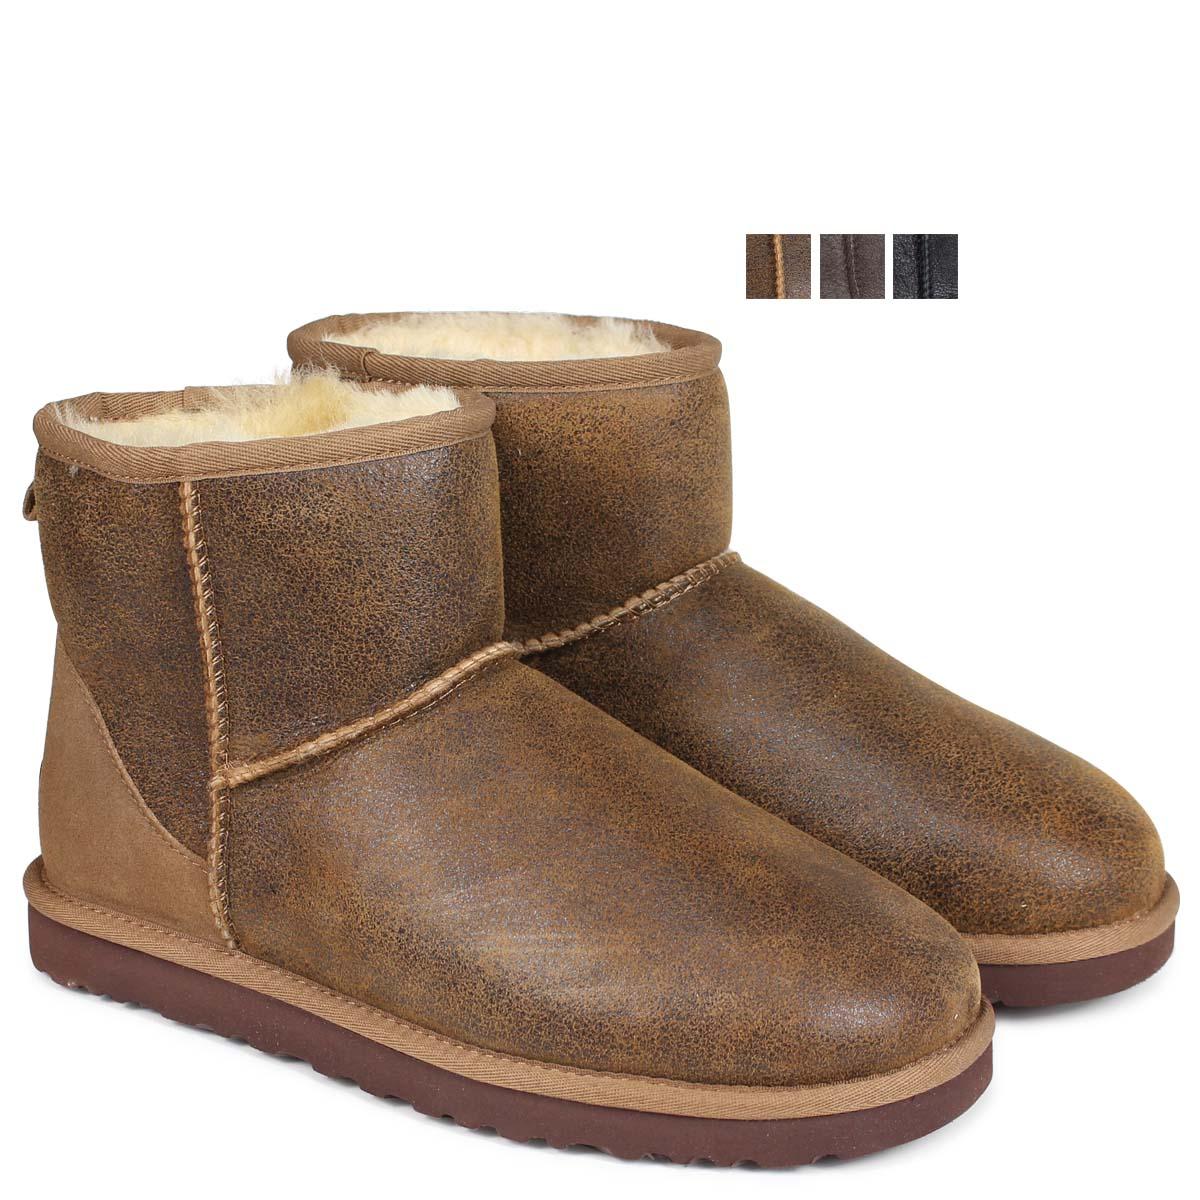 90072fafcce アグ UGG men classical music mini-mouton boots MENS CLASSIC MINI BOMBER  1007307 sheepskin